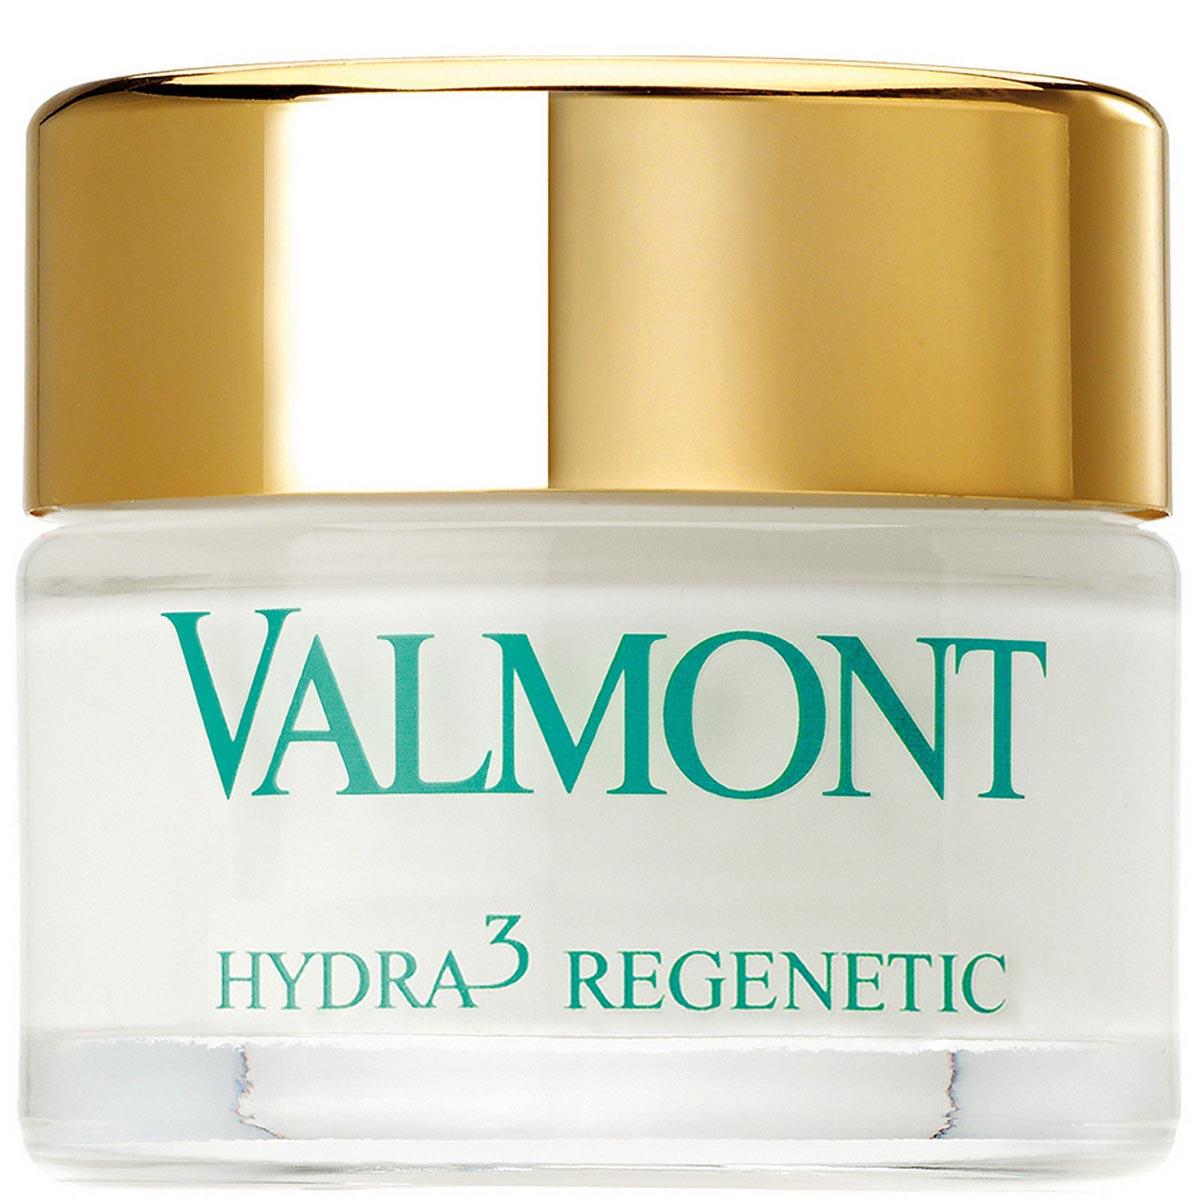 Valmont hydra3 regenetic 50ml